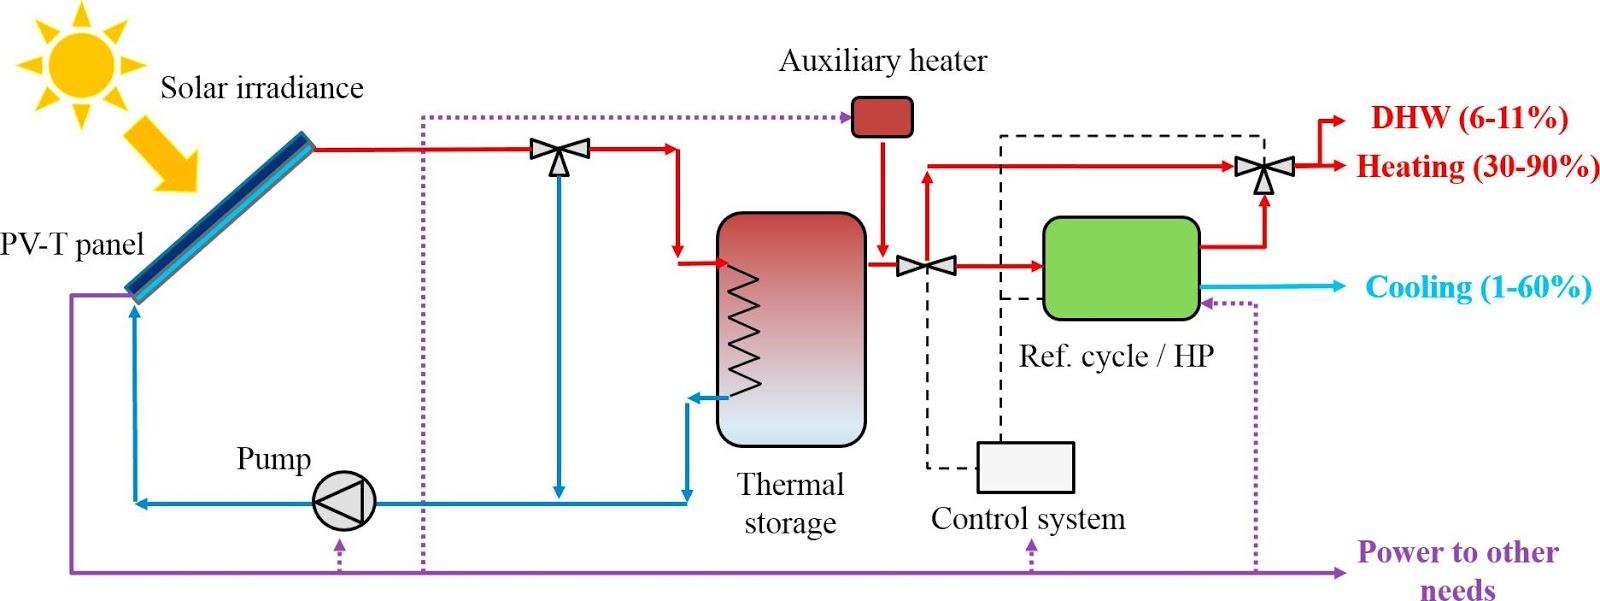 solar irradiance heating solar panels